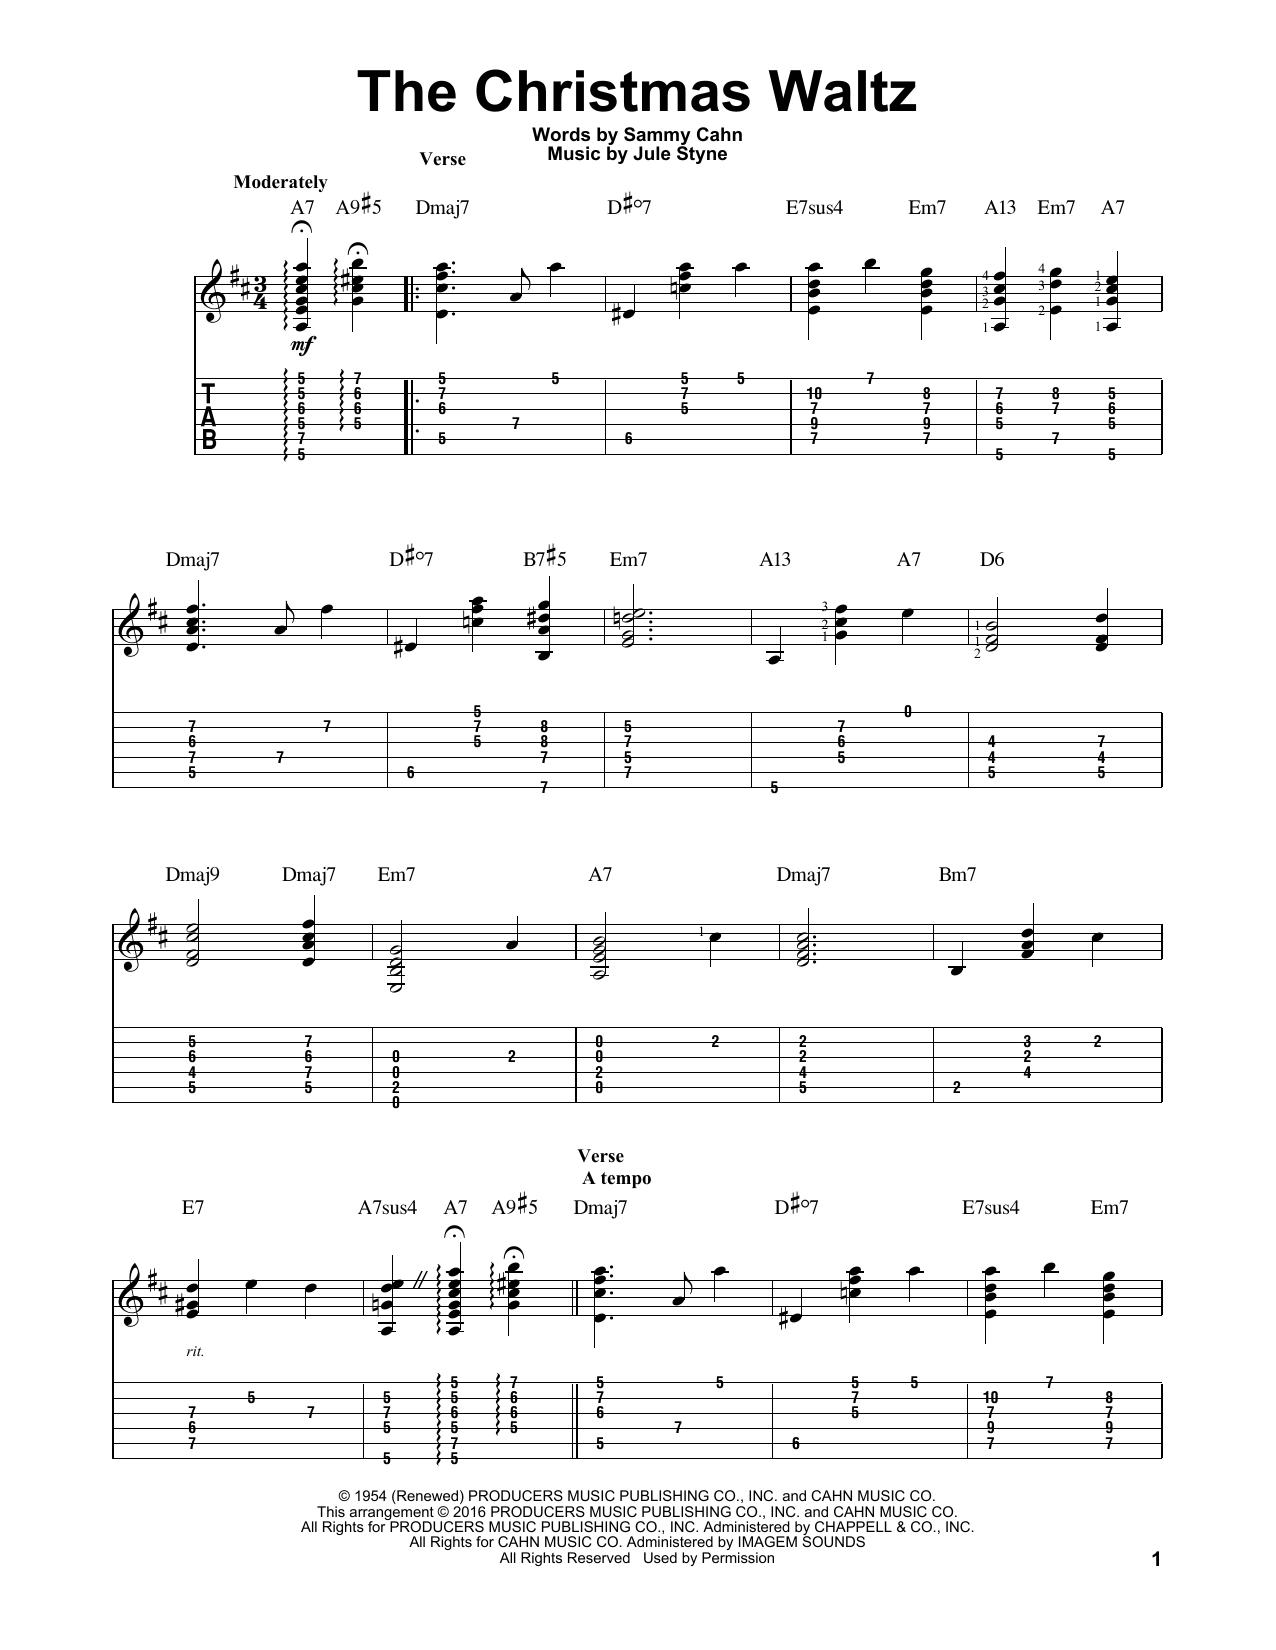 The christmas waltz guitar tab by sammy cahn guitar tab 173248 sammy cahn the christmas waltz guitar tab hexwebz Images